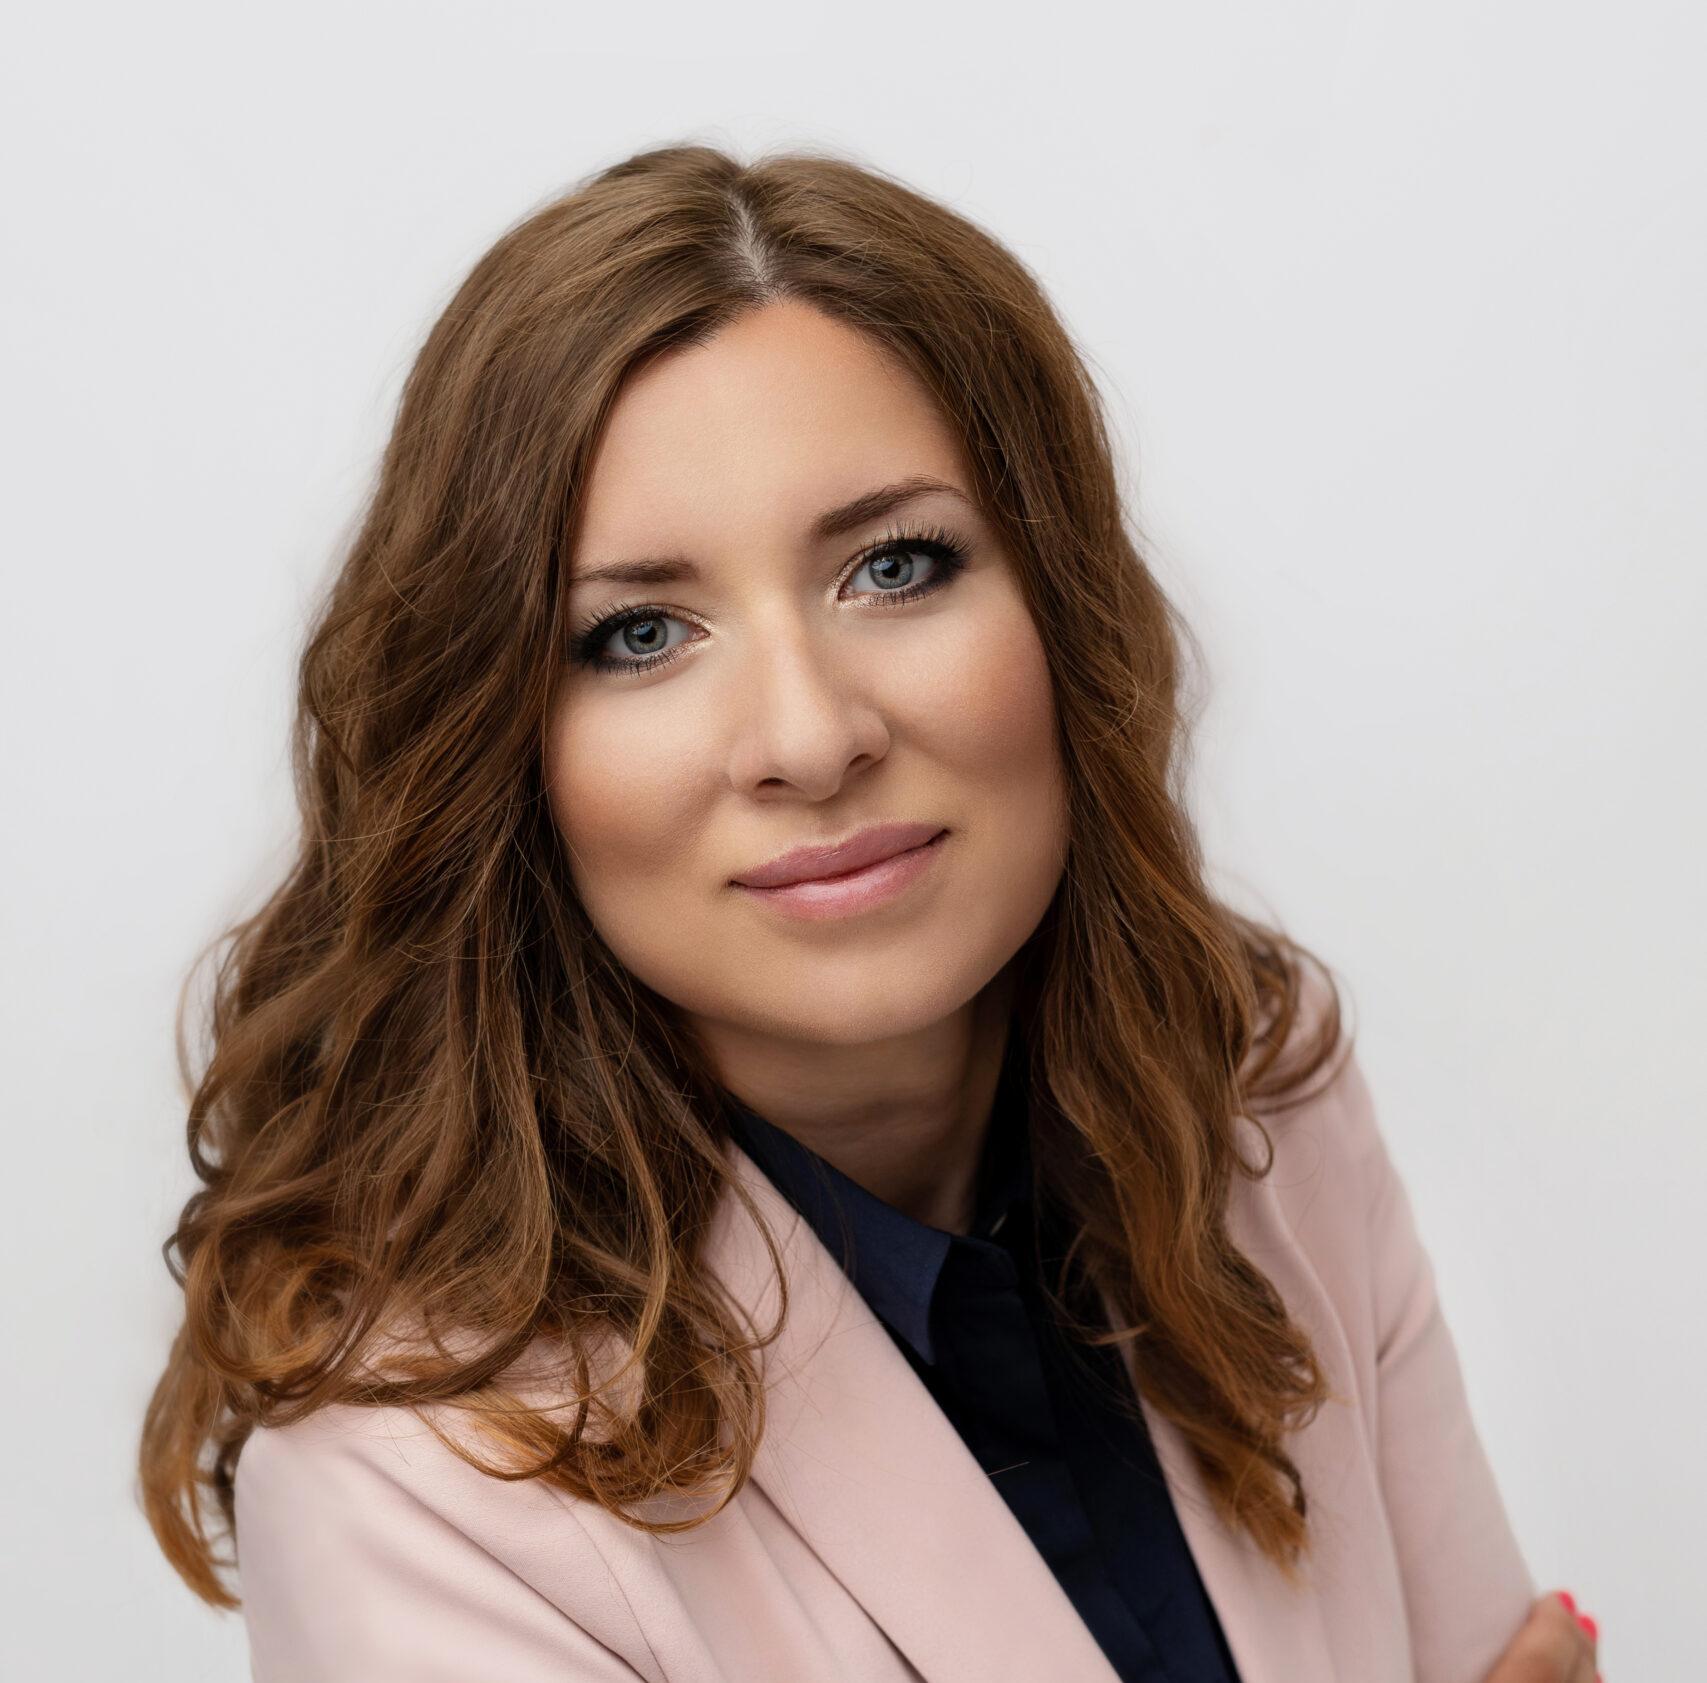 Agnieszka Larysa Kubiak